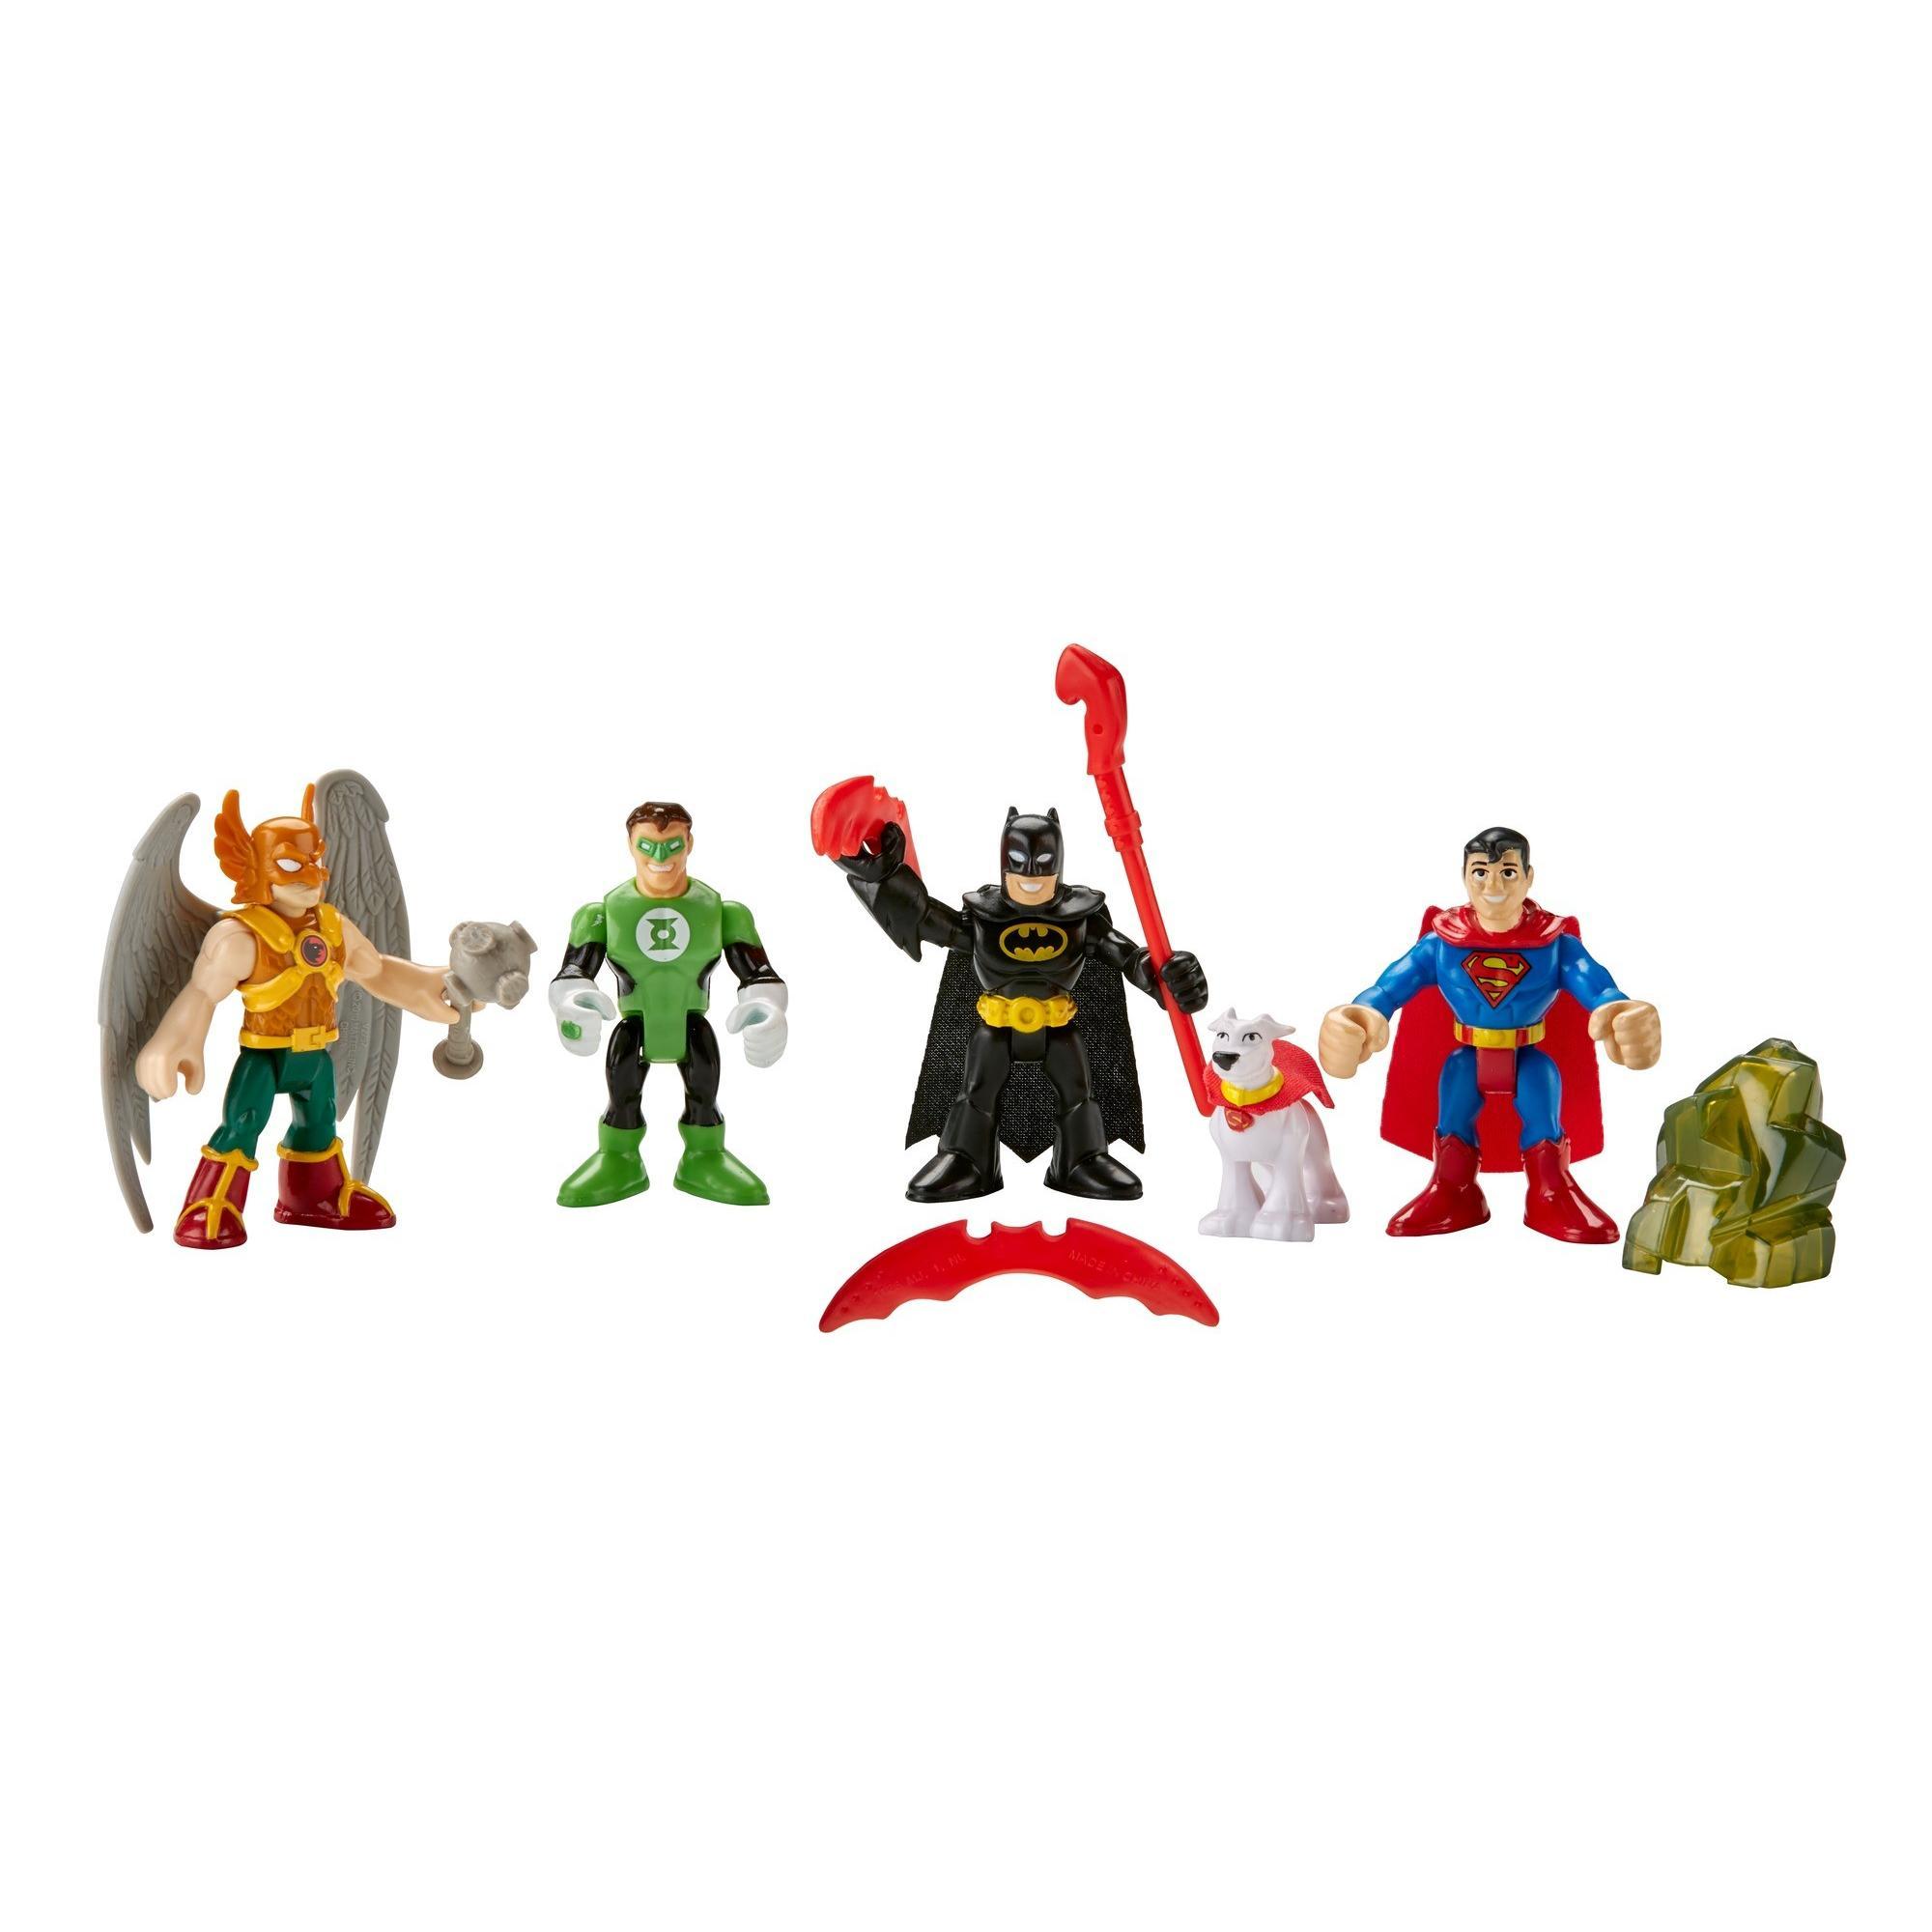 Imaginext DC Super Friends Heroes Action Figures Play Set